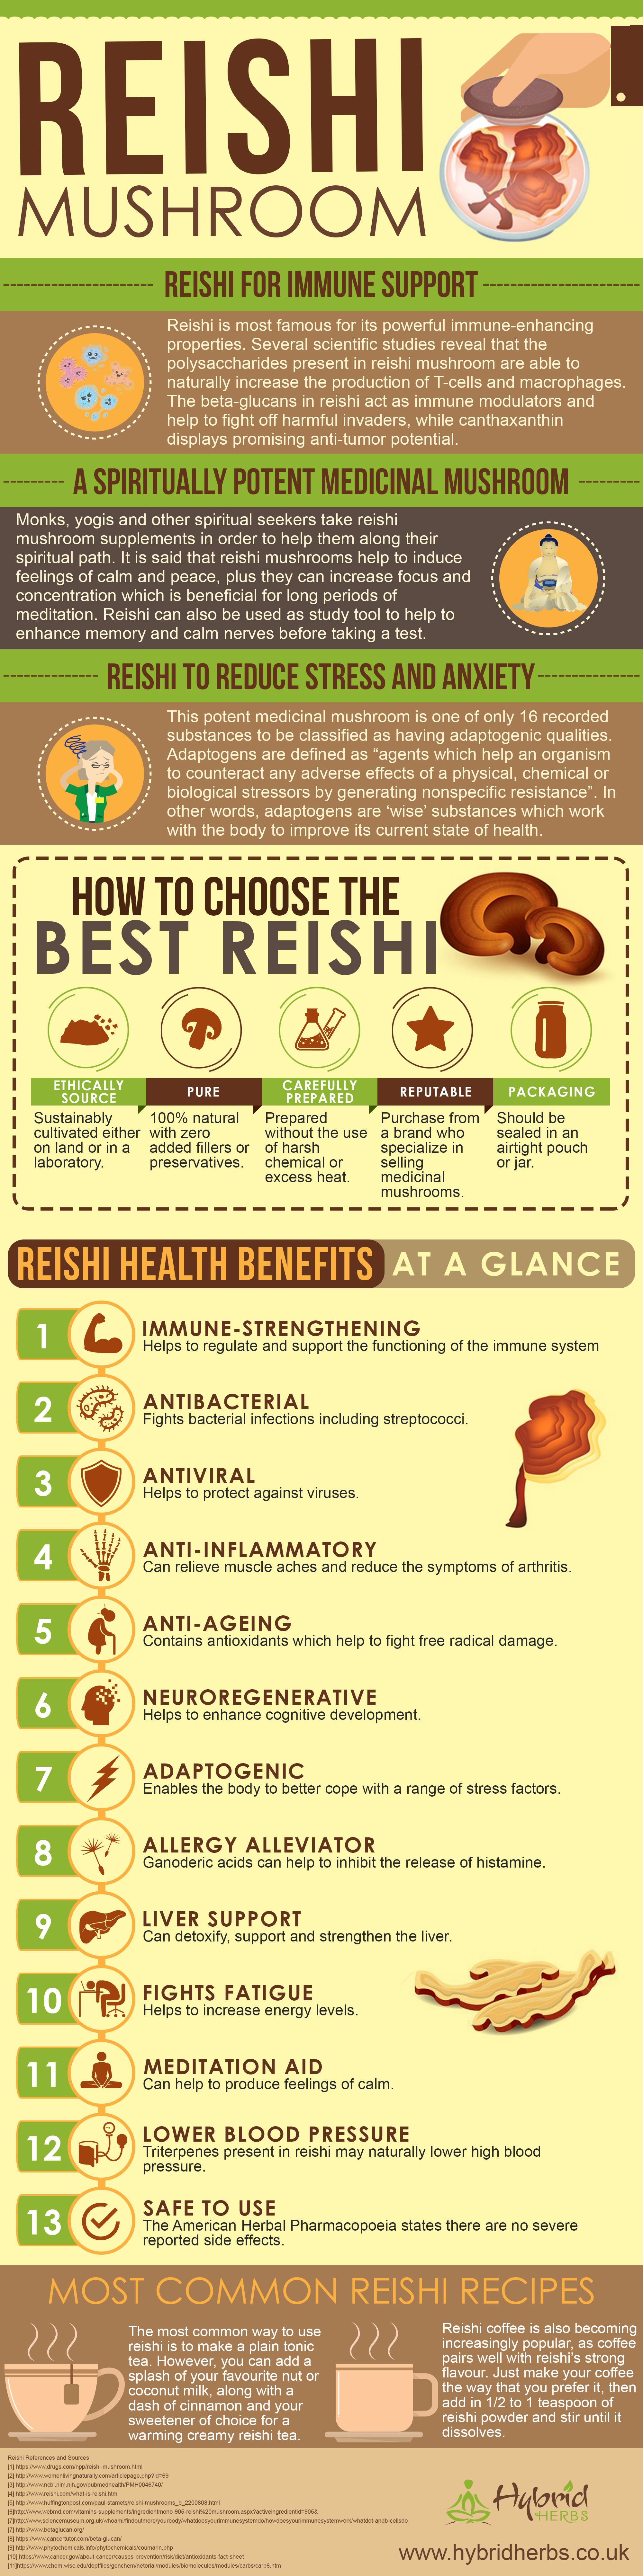 reishi-mushroom-health-benefits.jpg